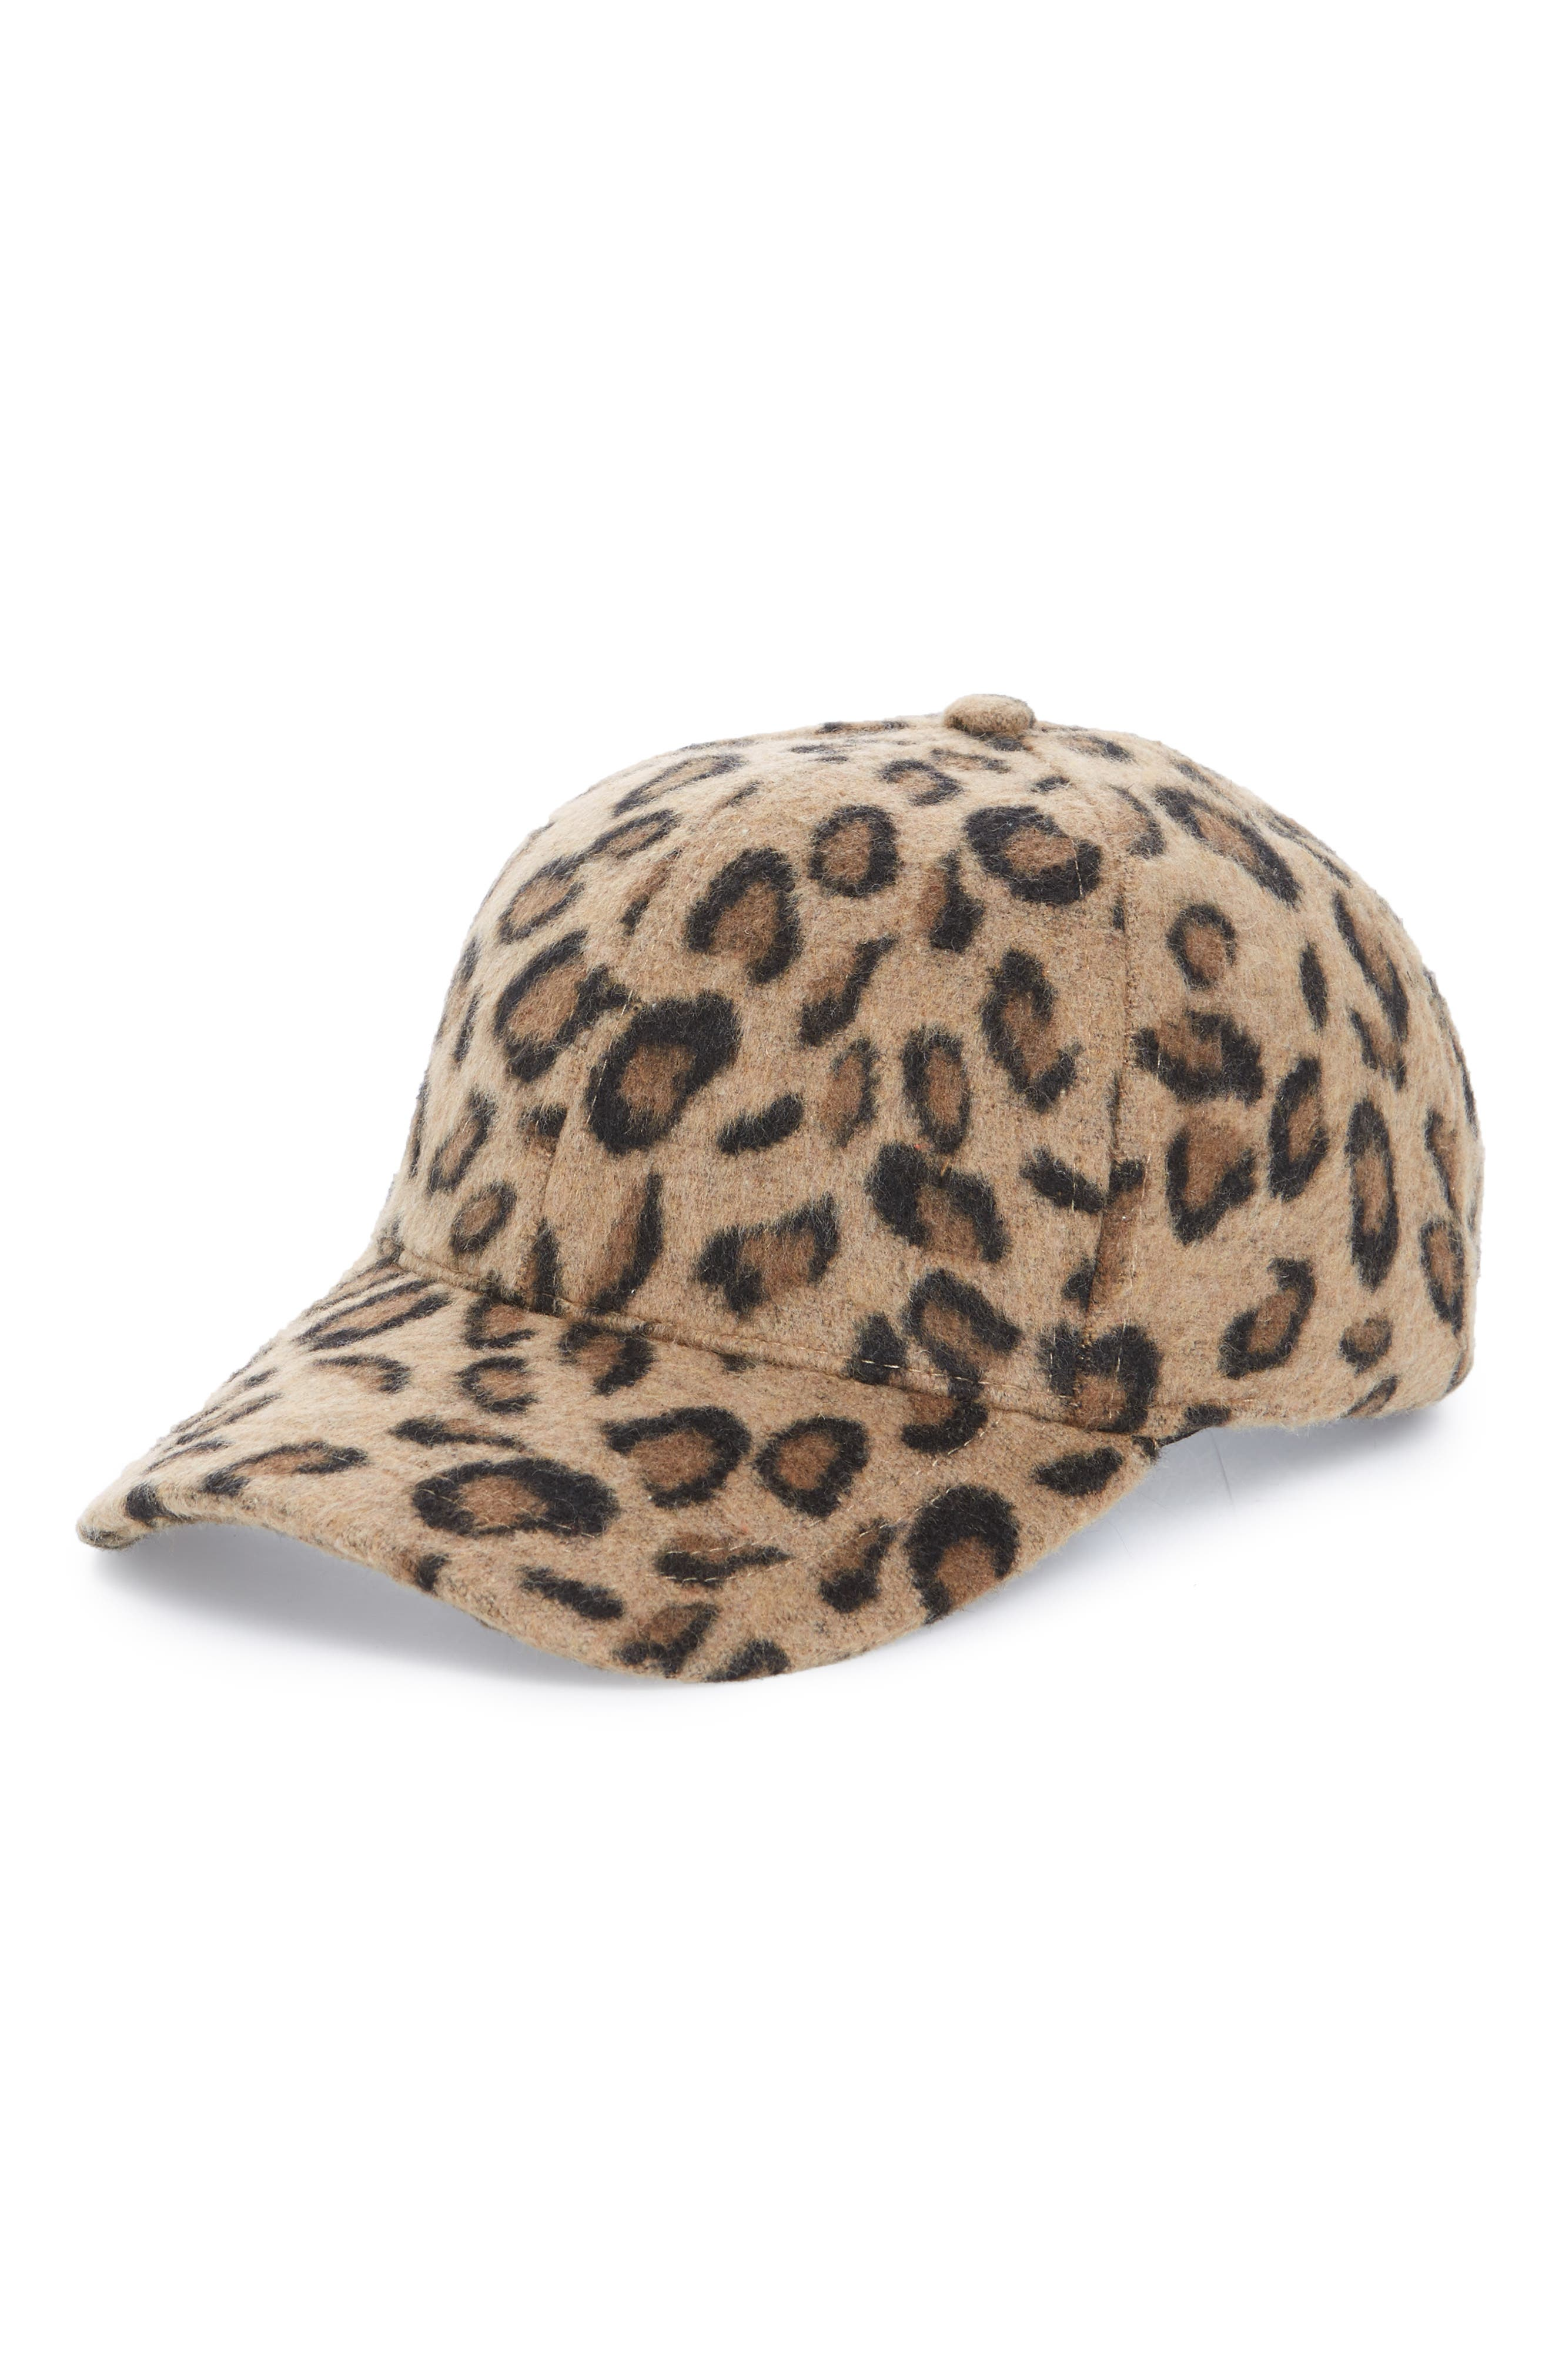 BP. Textured Leopard Print Baseball Cap